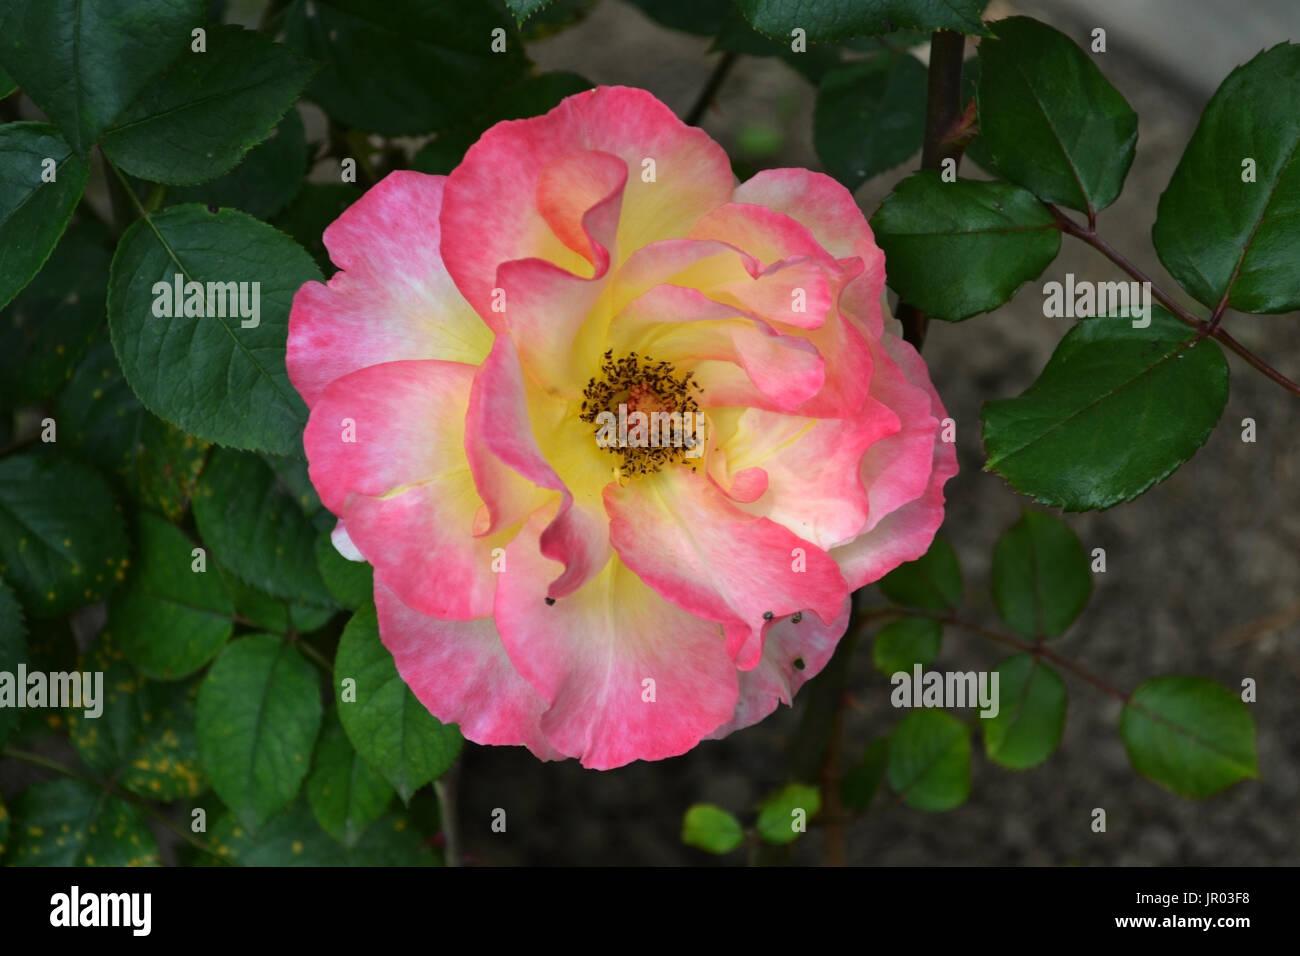 Rosas rosas cada día 2. Imagen De Stock